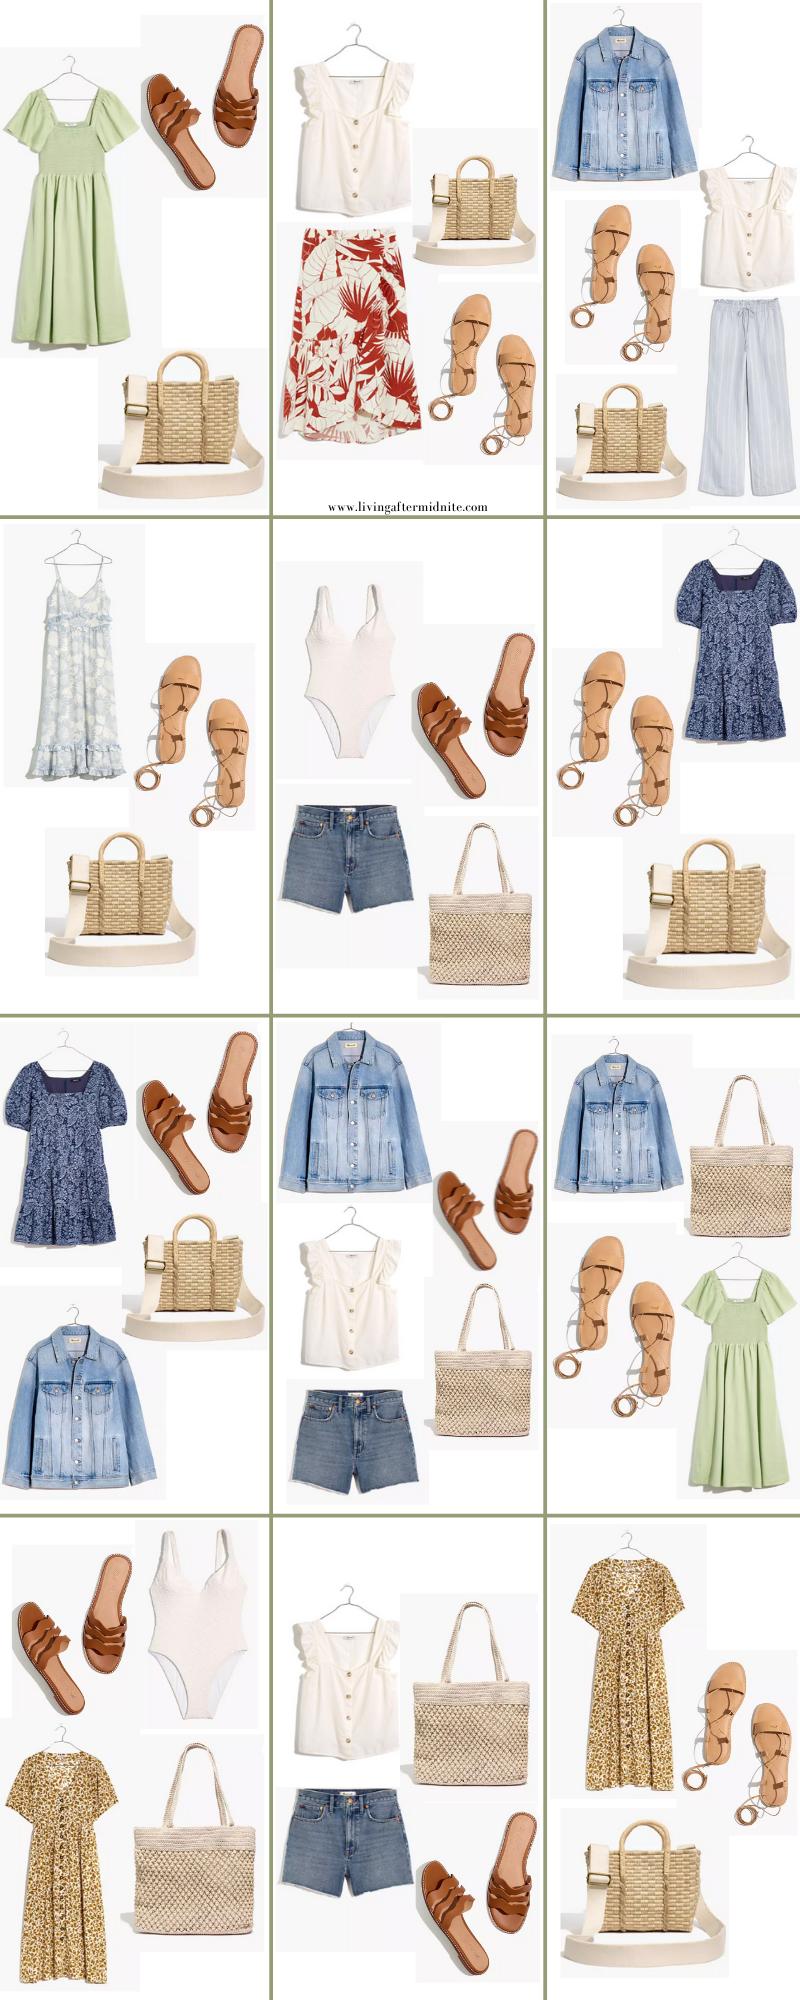 Madewell Summer Vacation Capsule Wardrobe